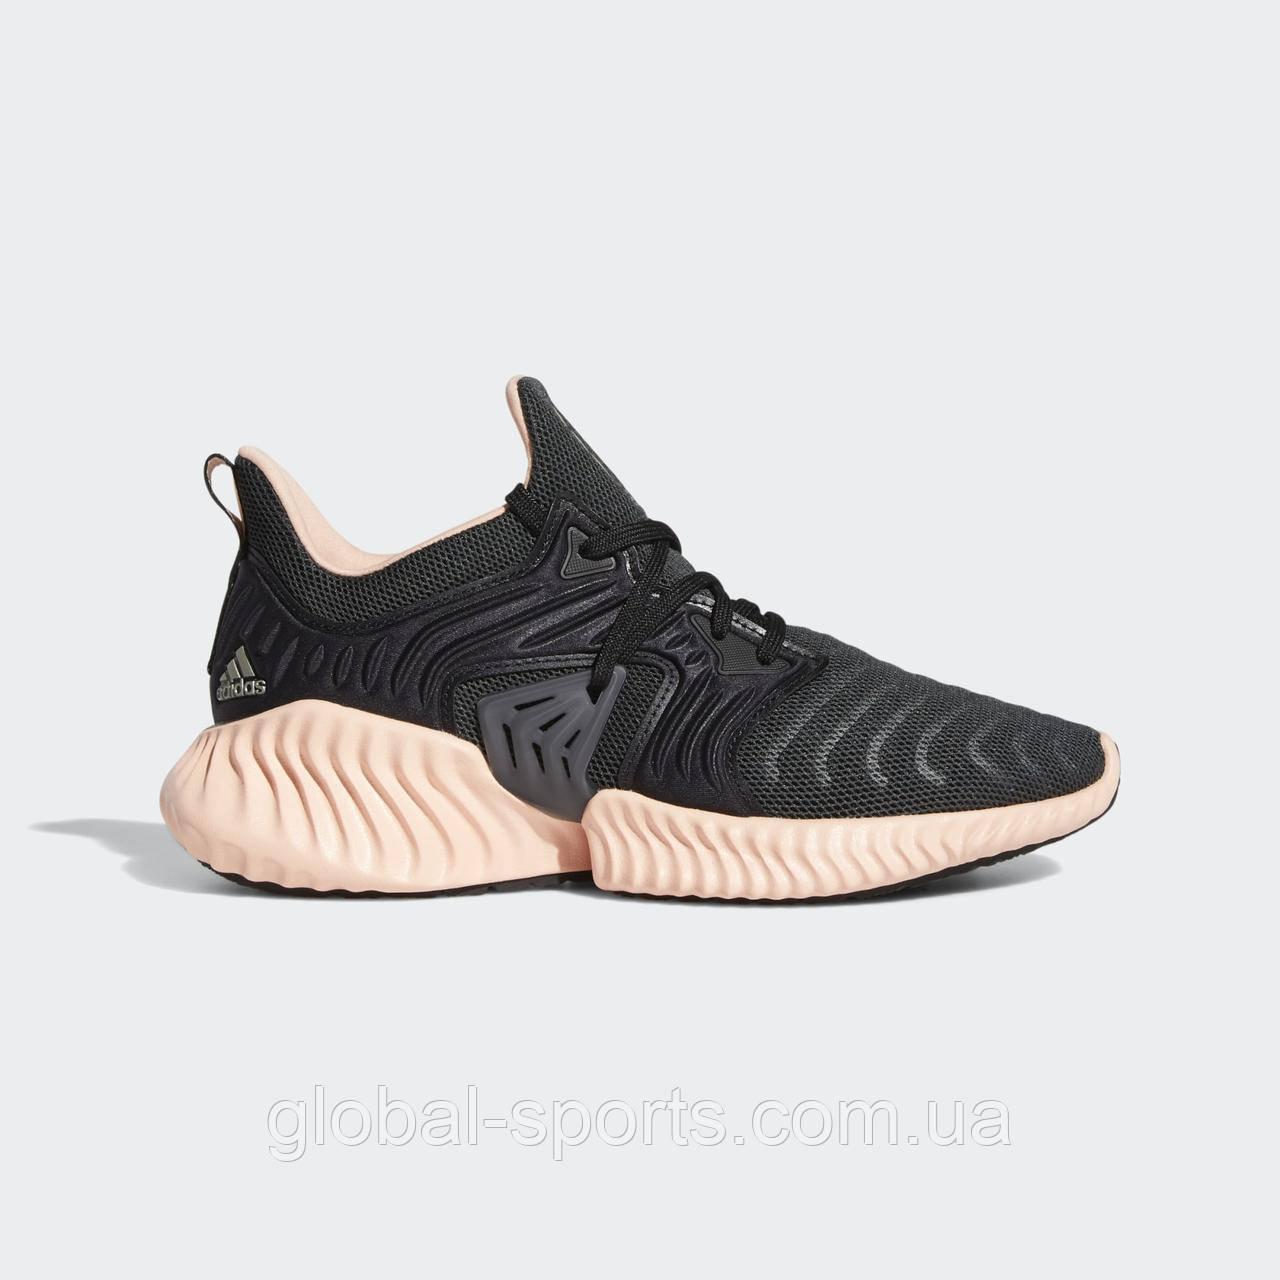 Женские кроссовки Adidas Alphabounce Instinct CC W (Артикул:F33937)